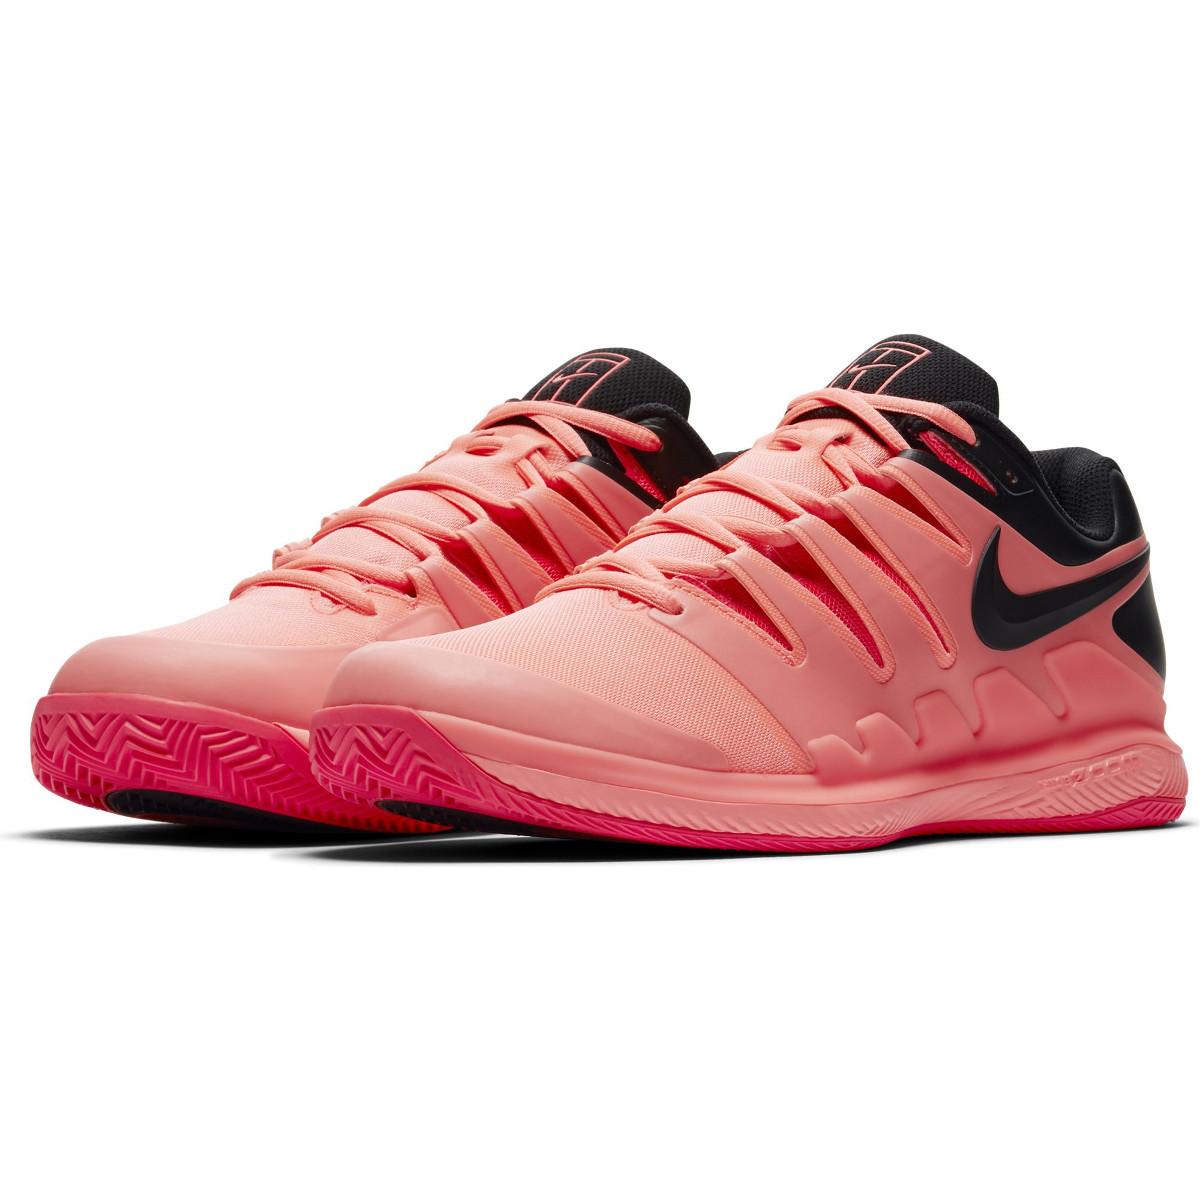 Nike-air-zoom-vapor-x-clay-men-s-tennis-shoes-lava-glow-black-solar-red-c.jpeg